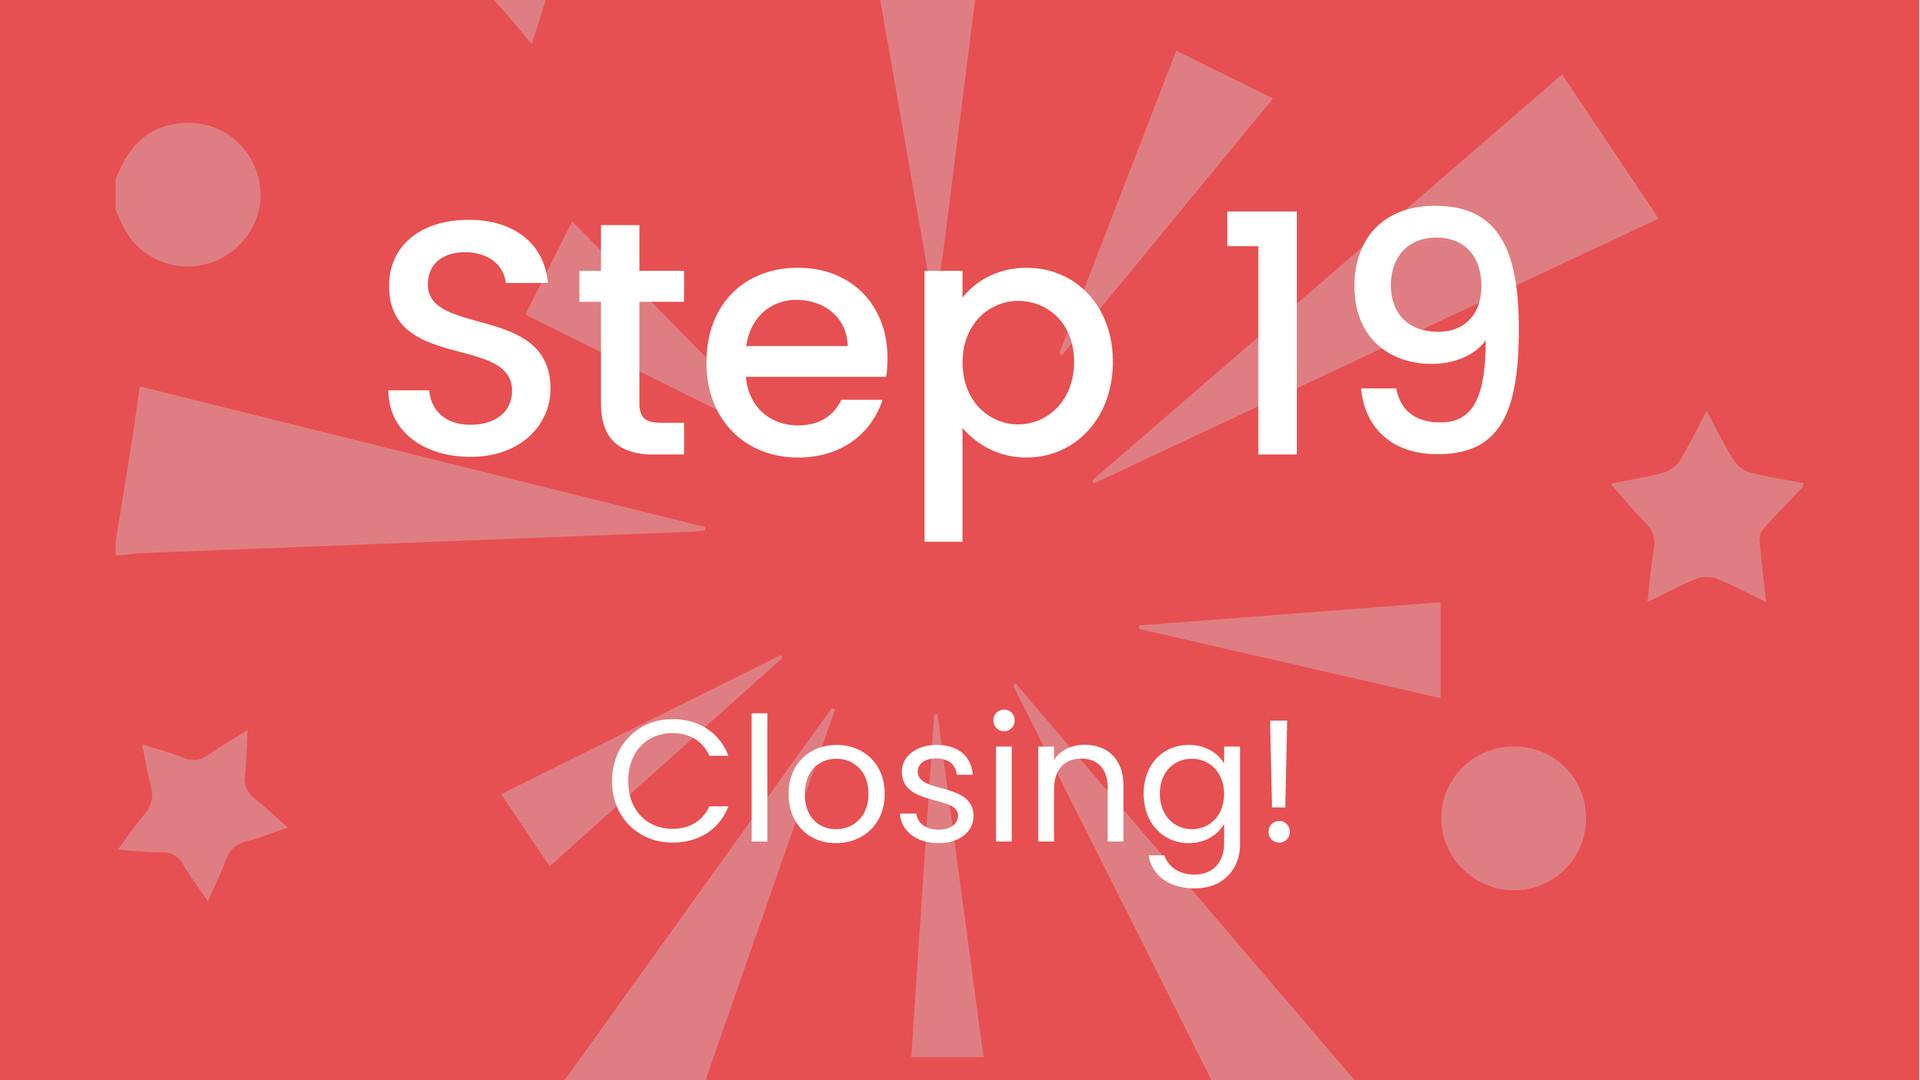 Step 19: Closing!